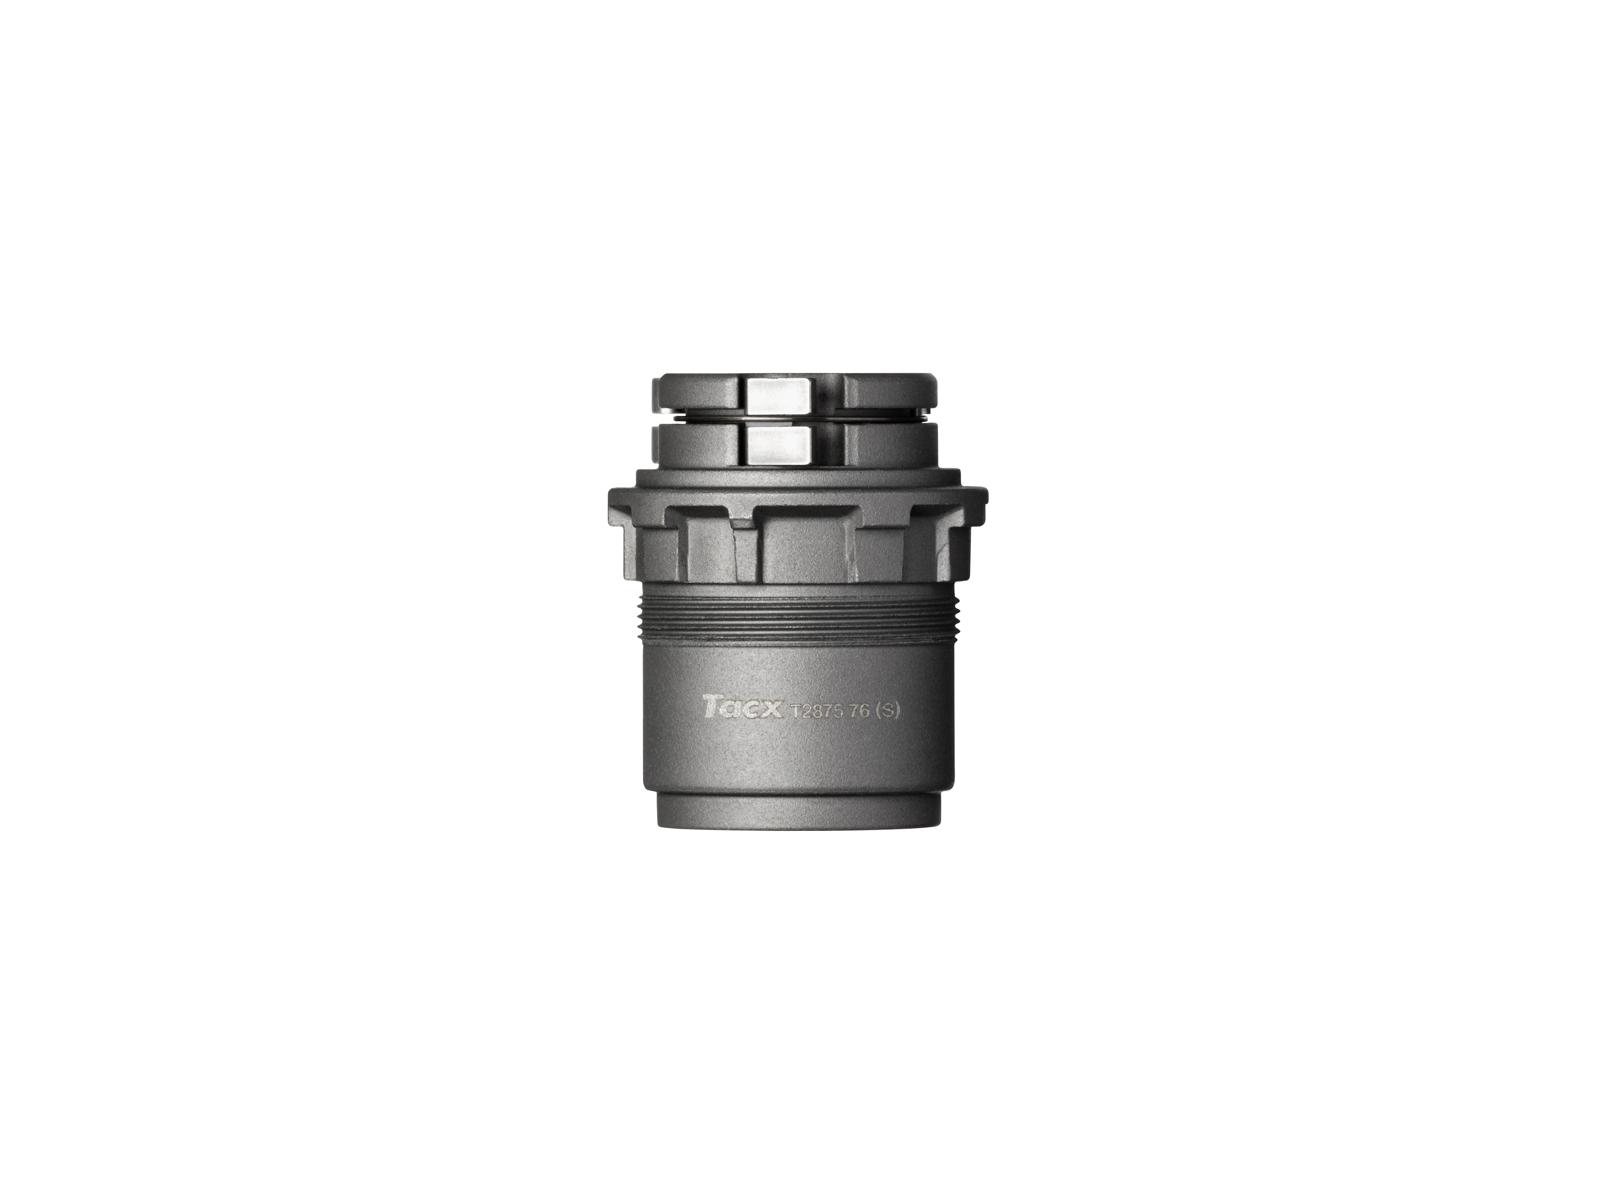 Flux S Tacx SRAM XD-R Moyeu 2020 Neo 2 T Flux 2 Direct Drive Baskets